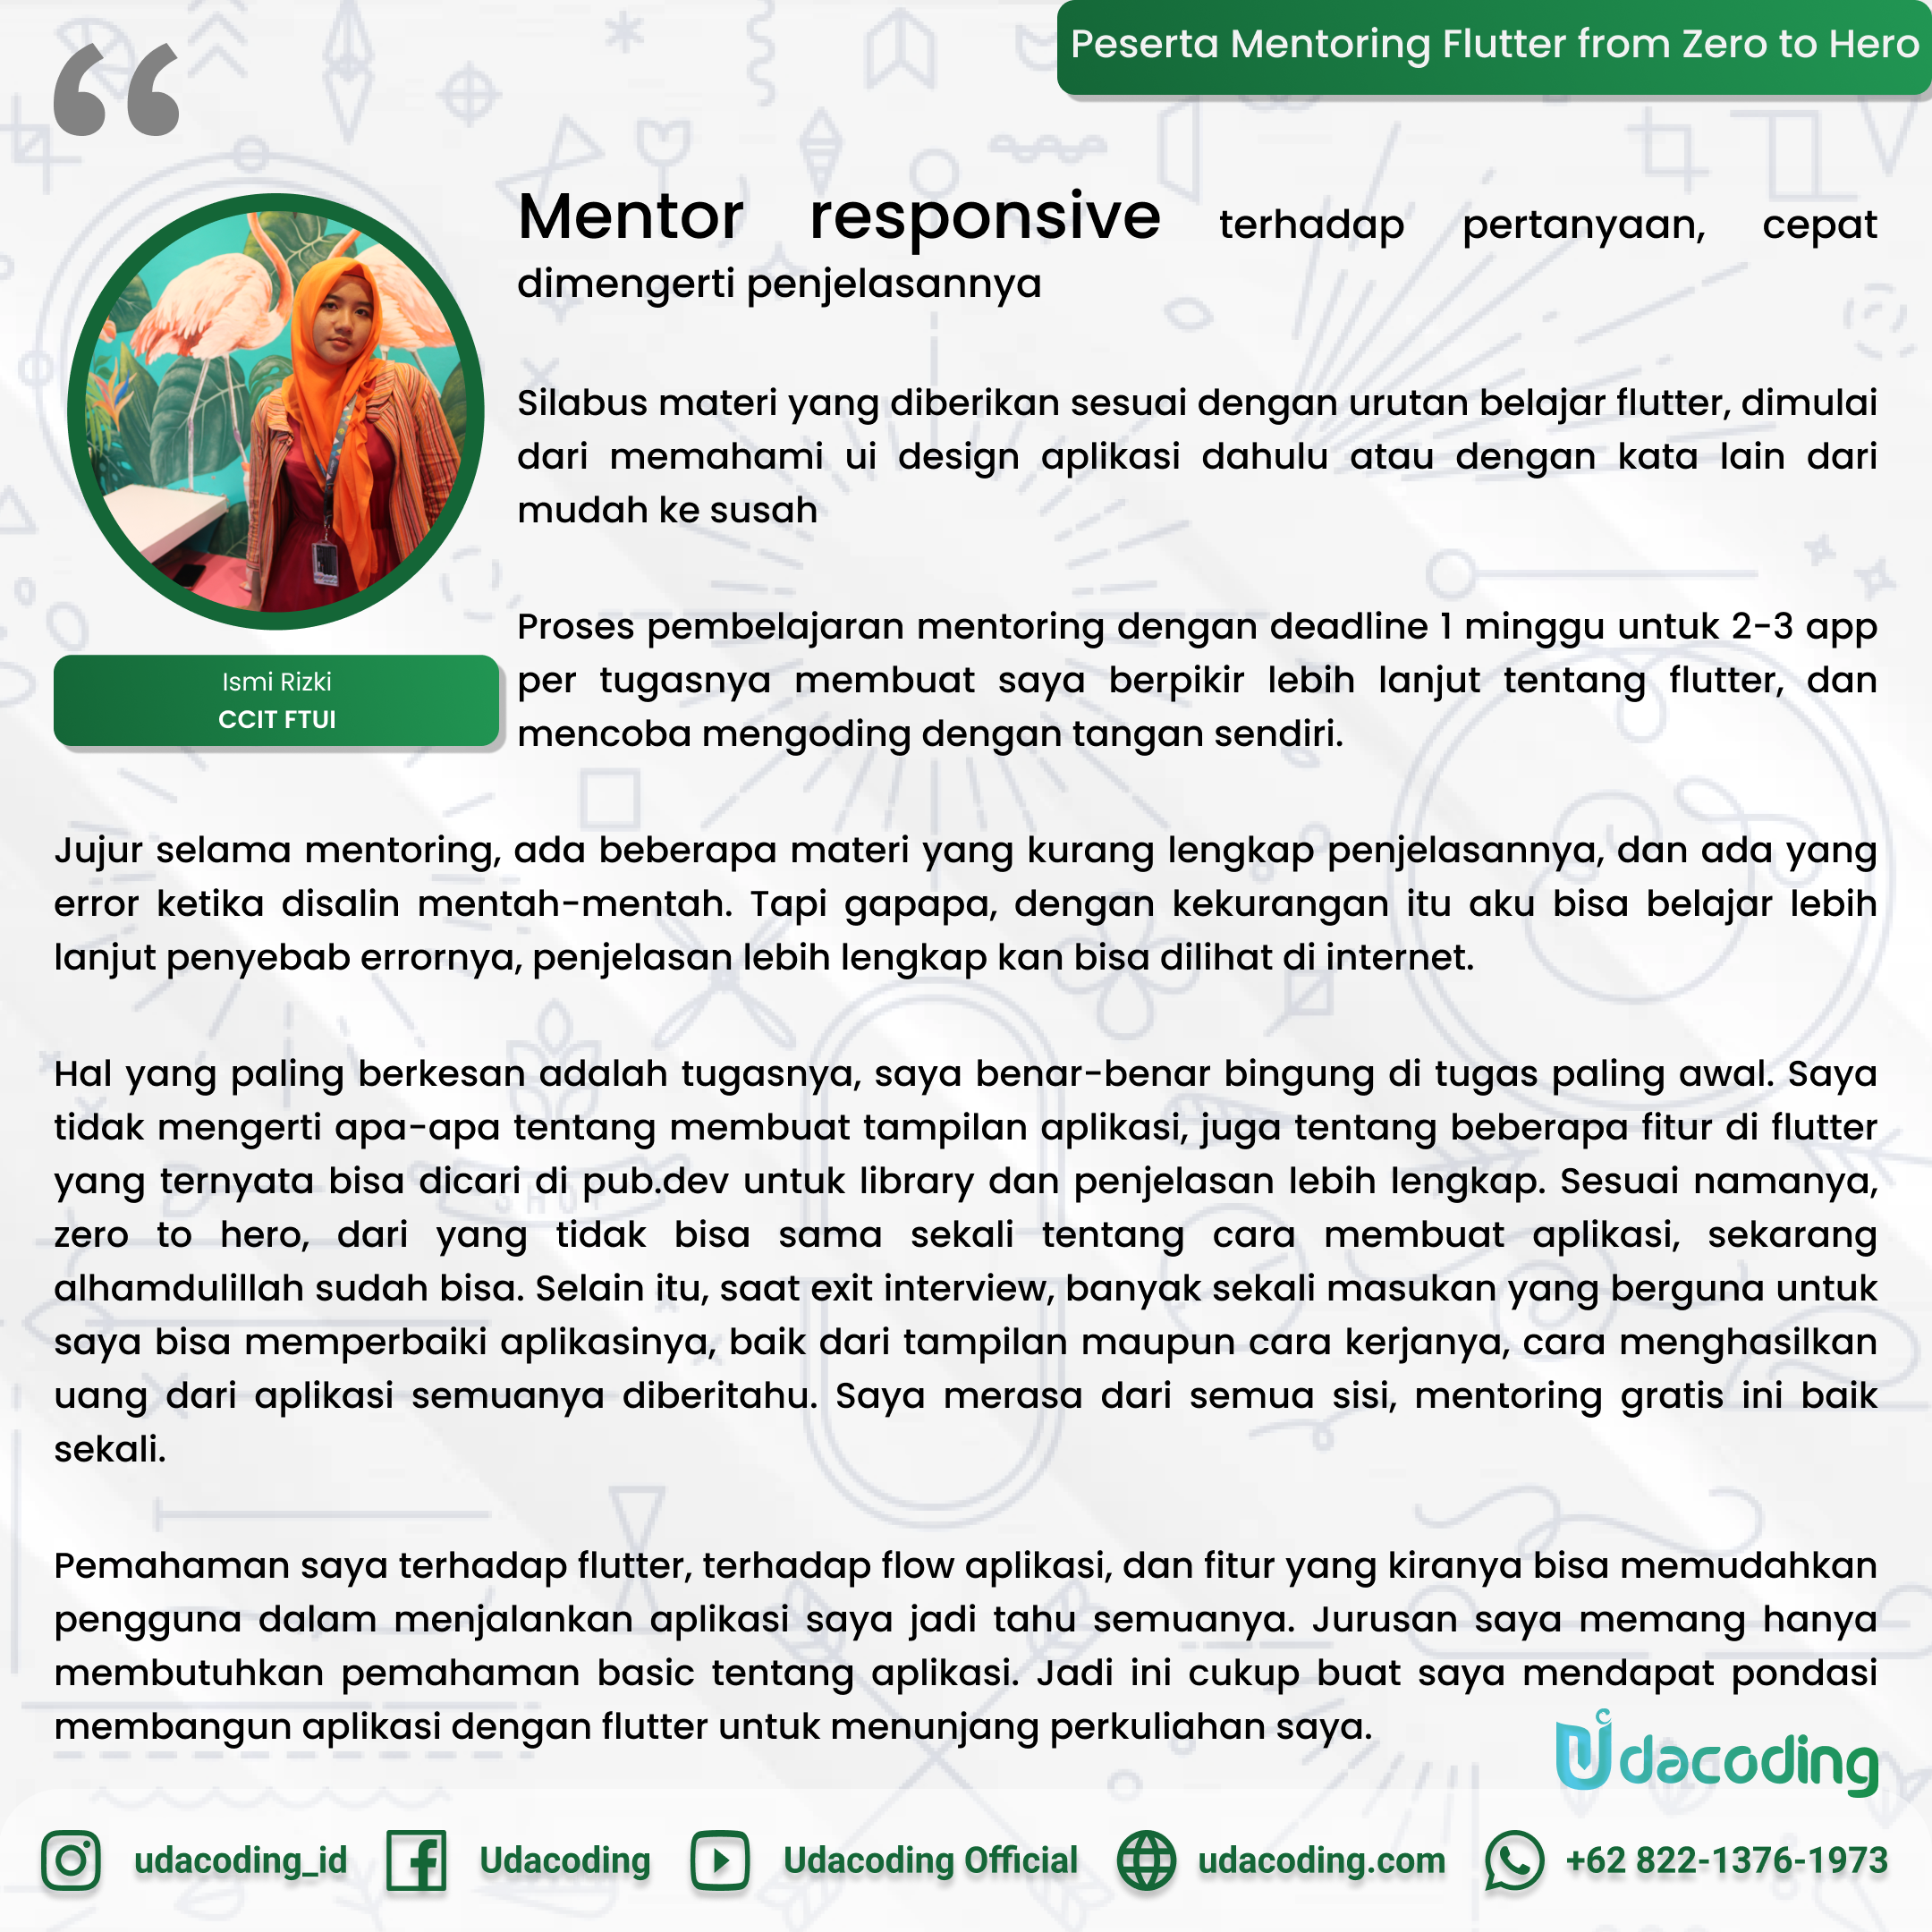 Udacoding Mentoring